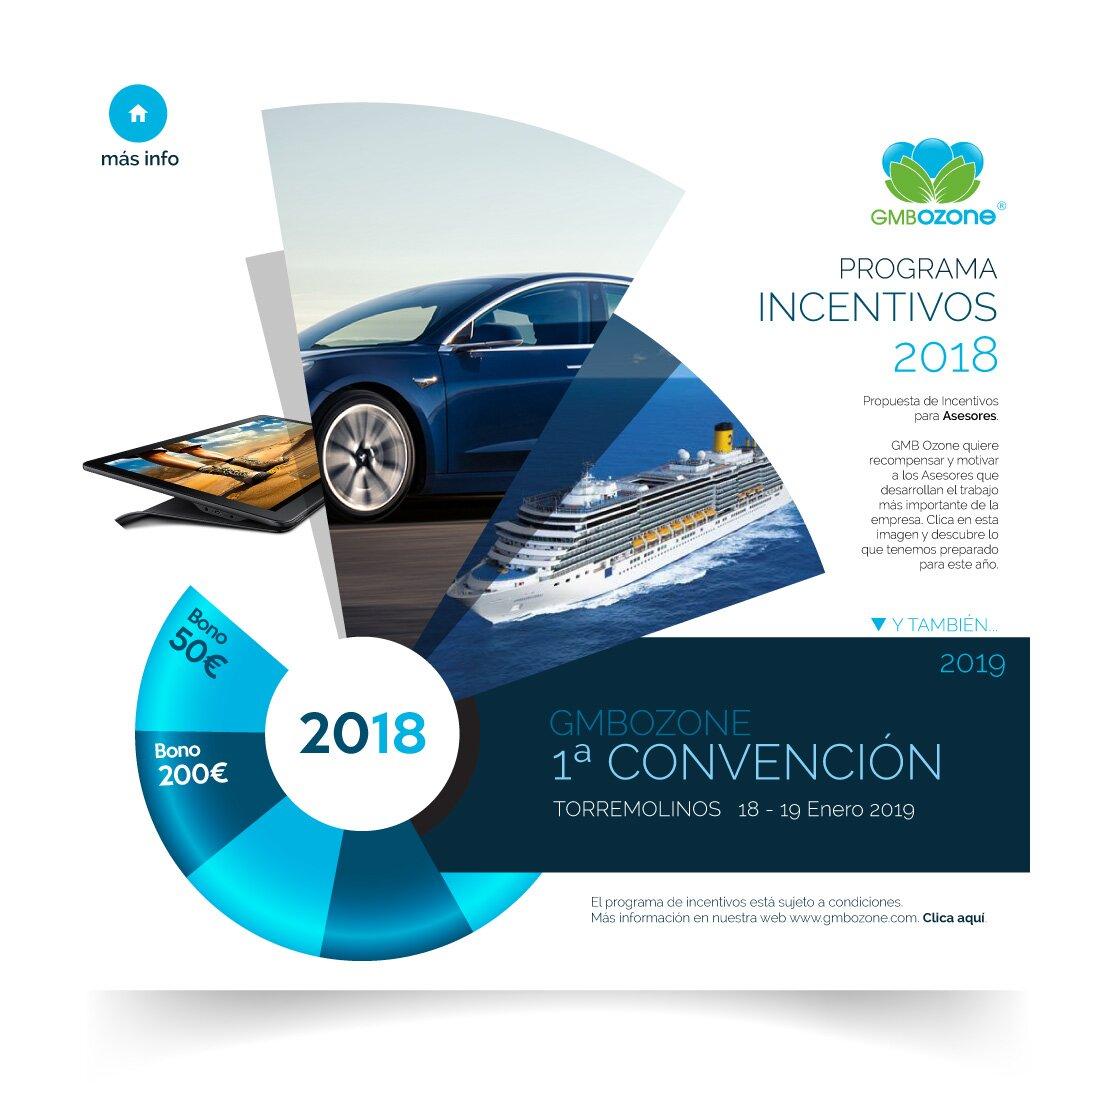 Incentivos 2018